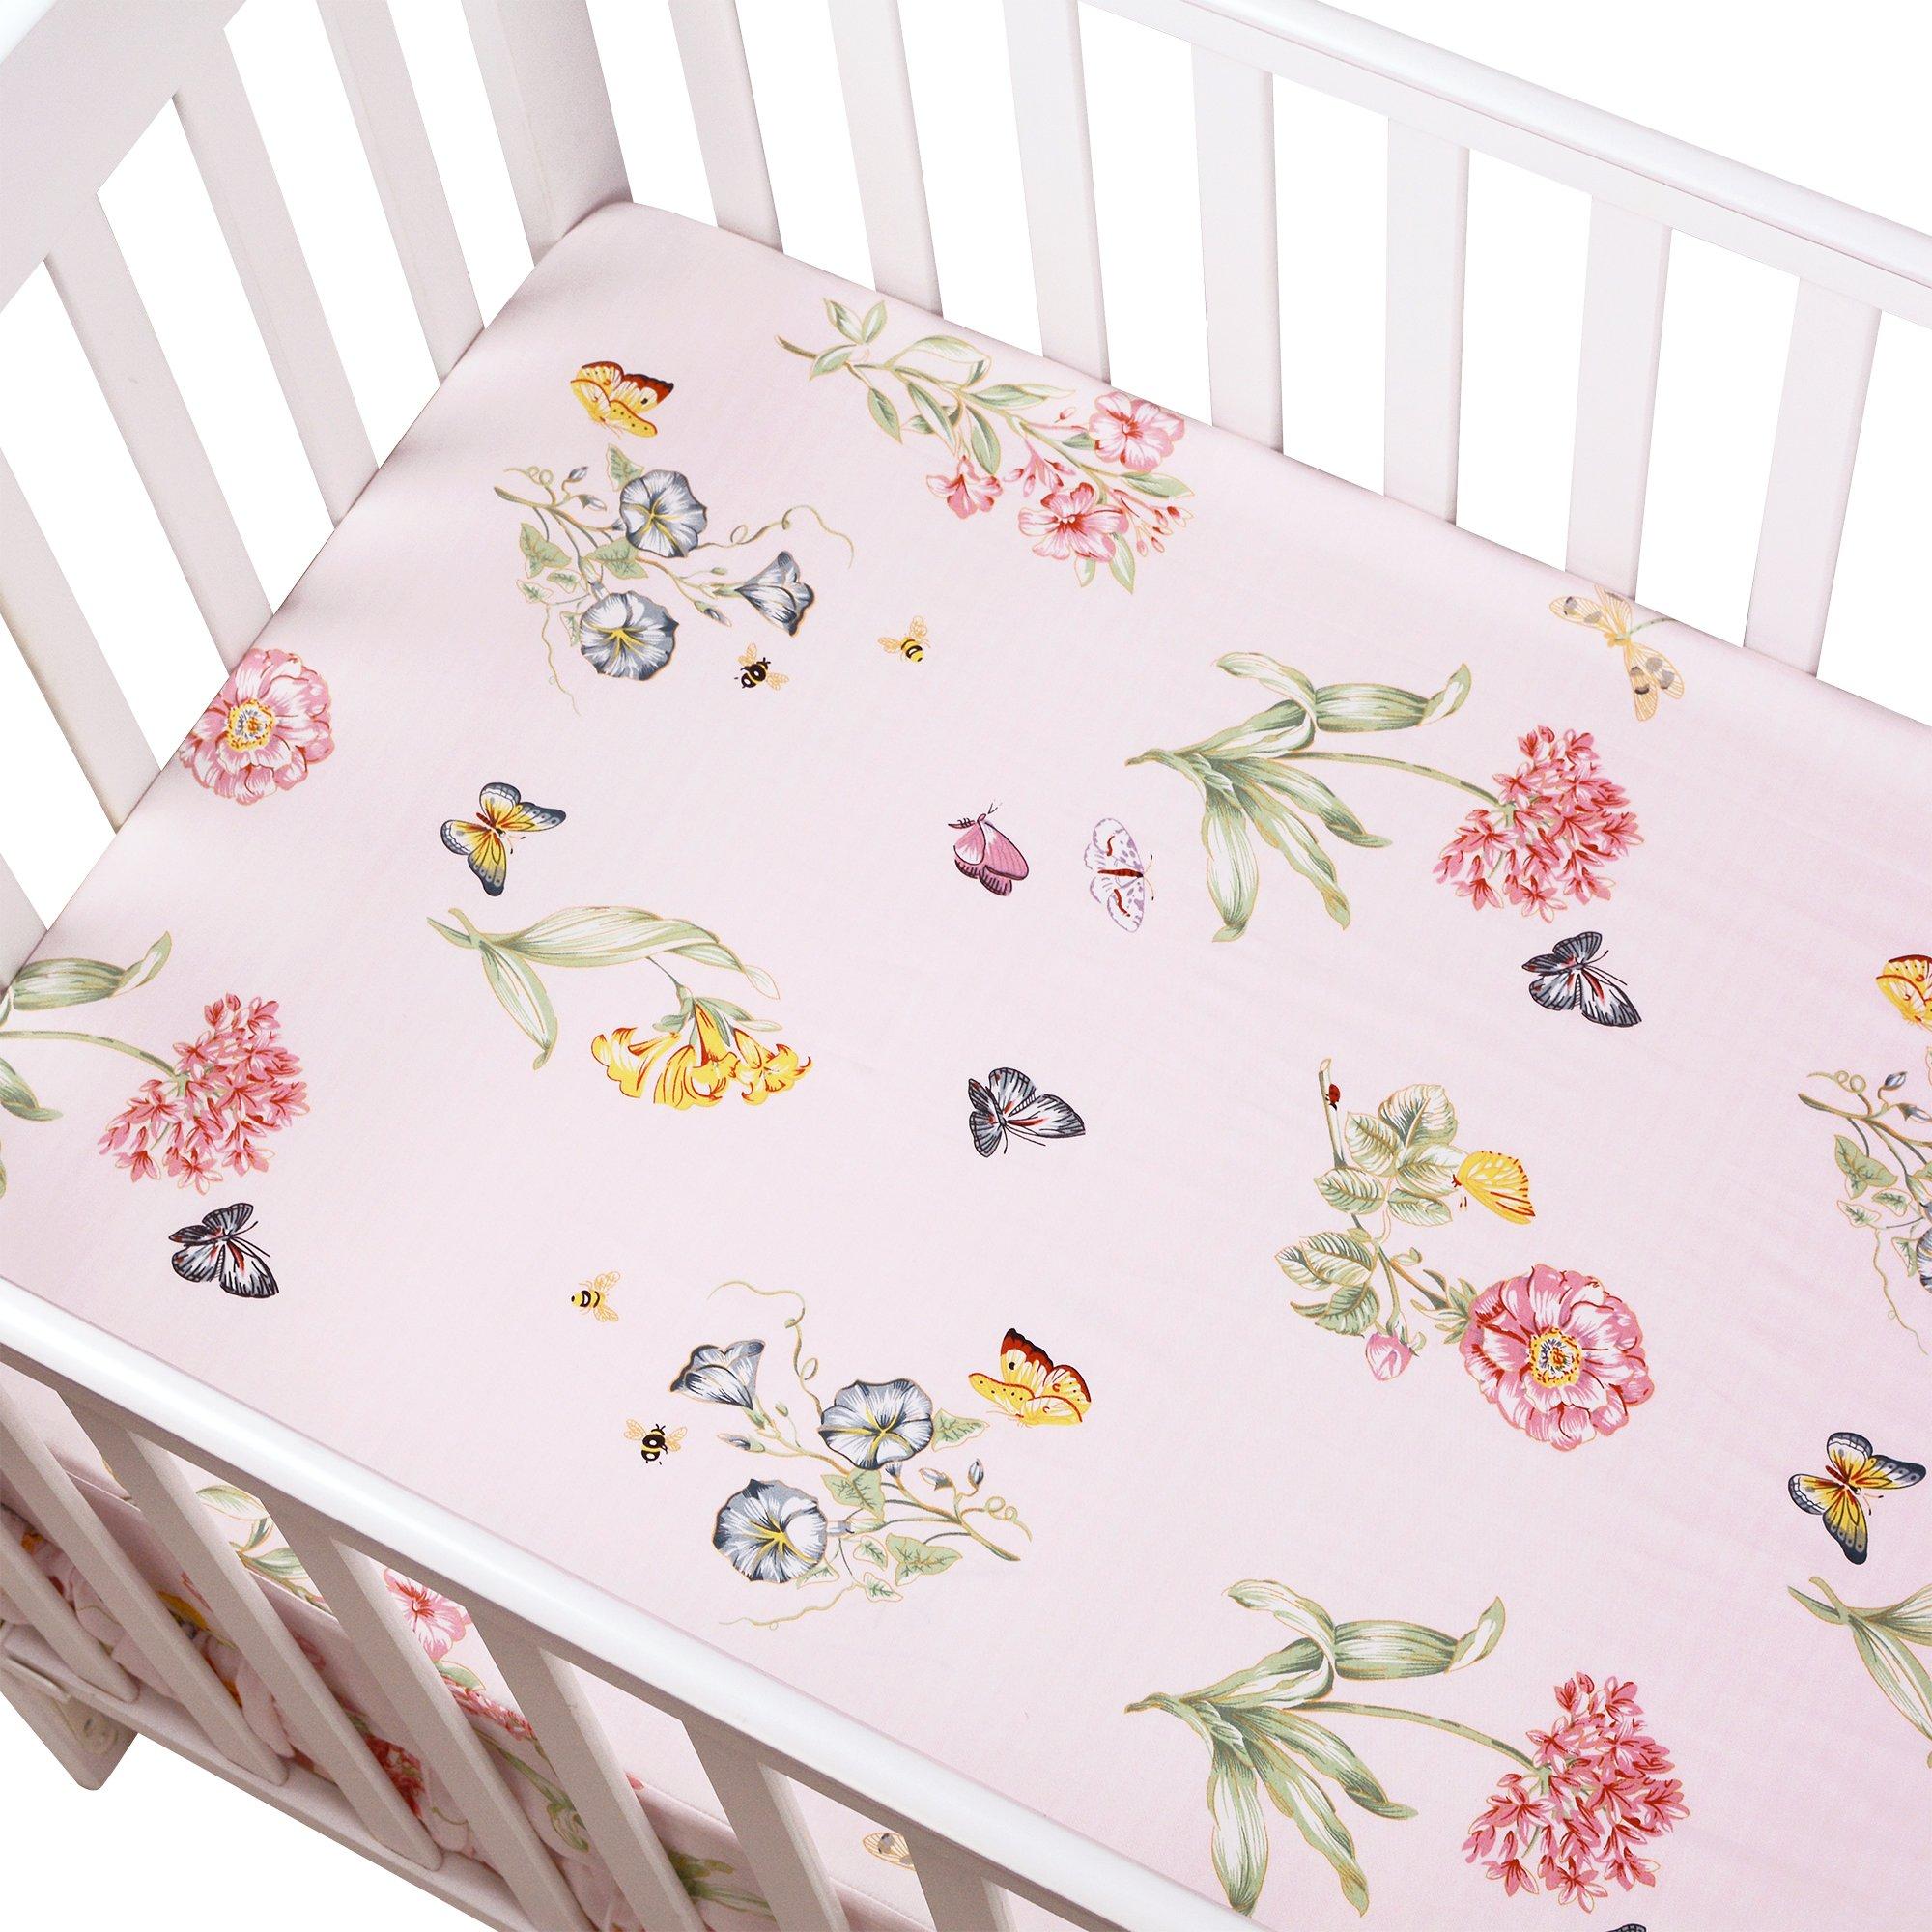 ip baby crib peanut bedding rose com shell piece walmart design purple cotton quilt cribs floral skirt and the set sheet